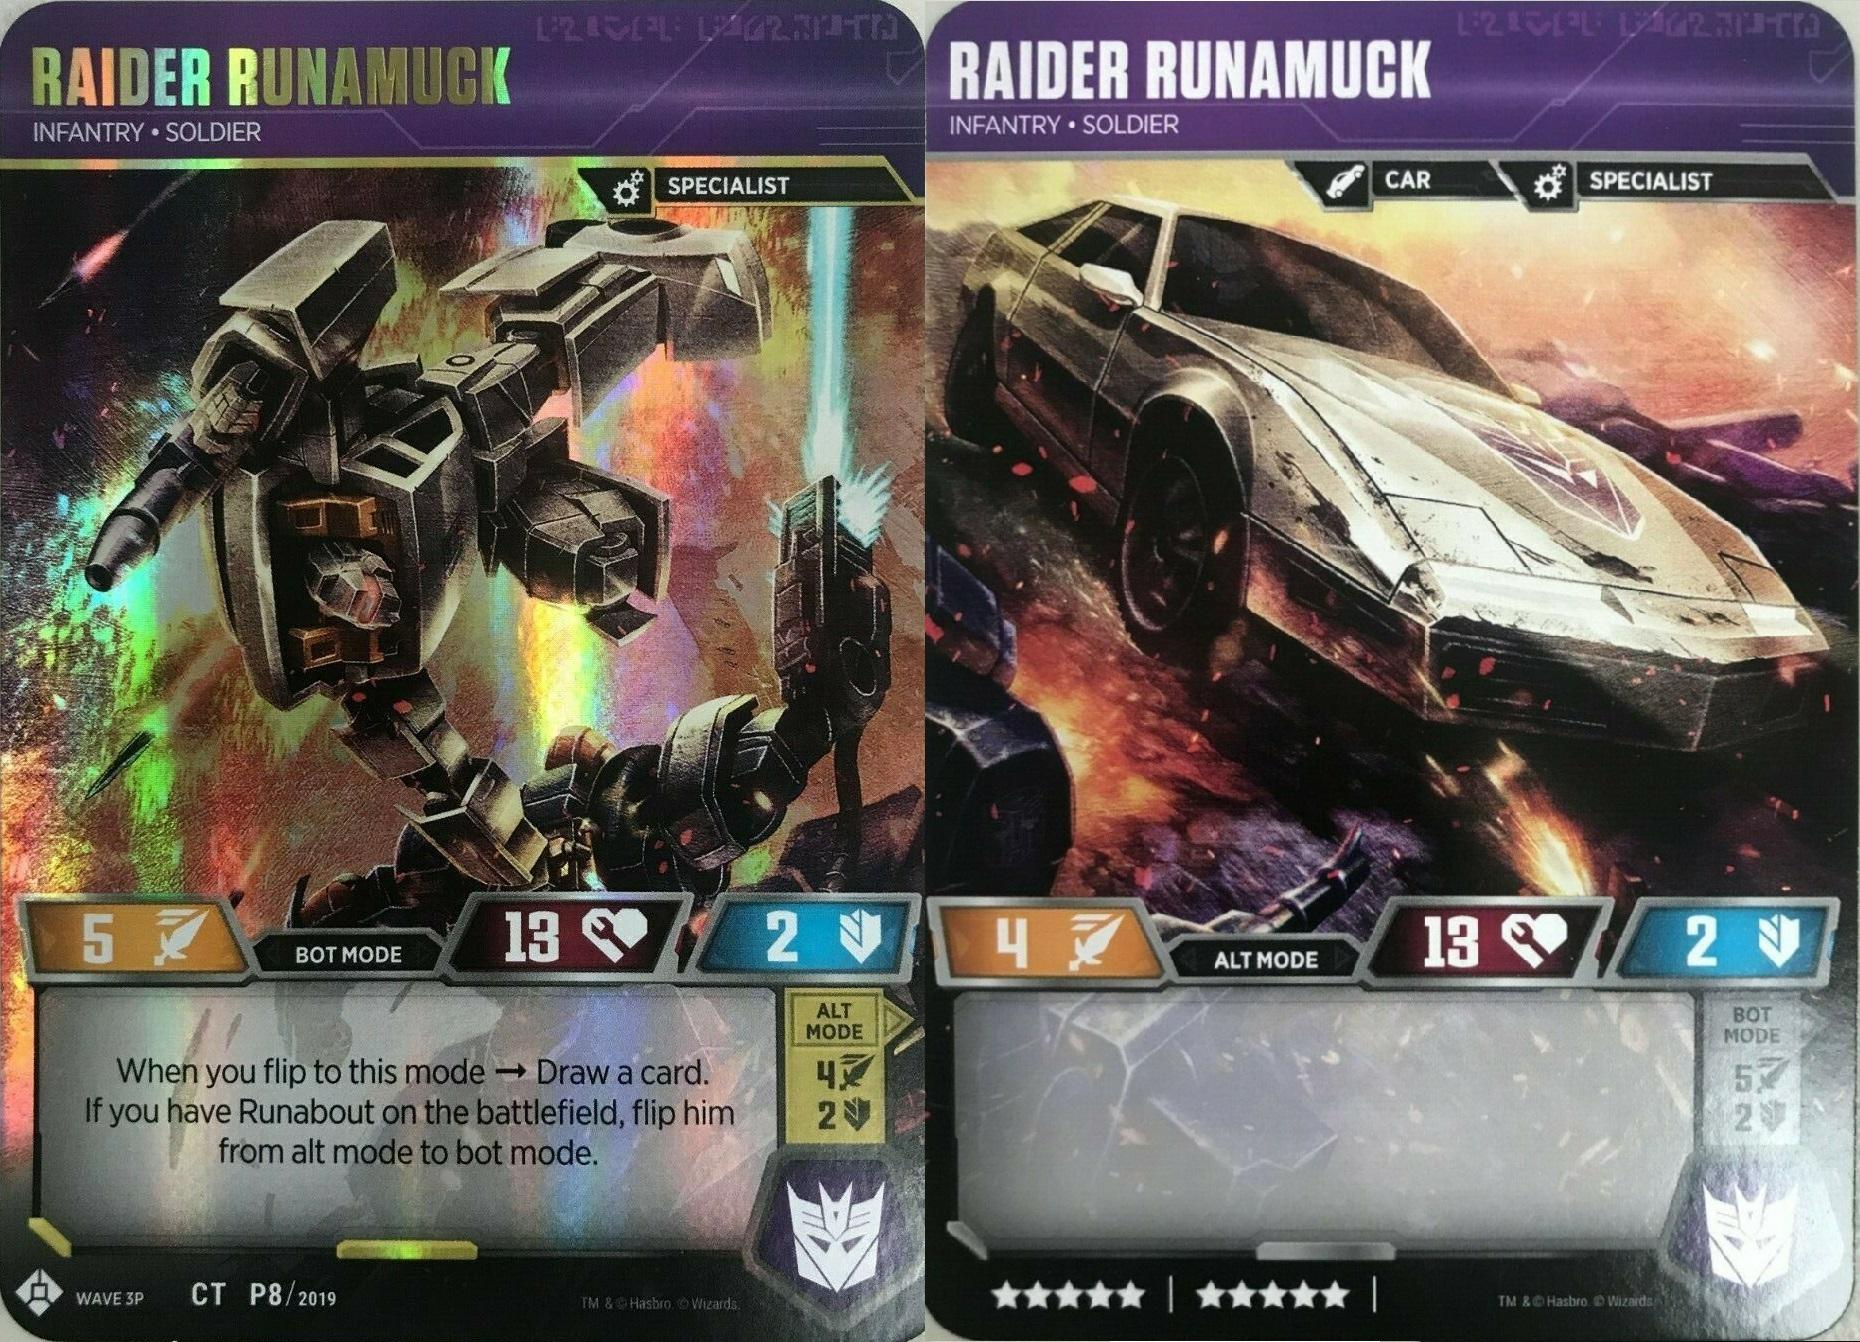 Raider Runamuck // Infantry Soldier (In-Store Play Gold Promo)